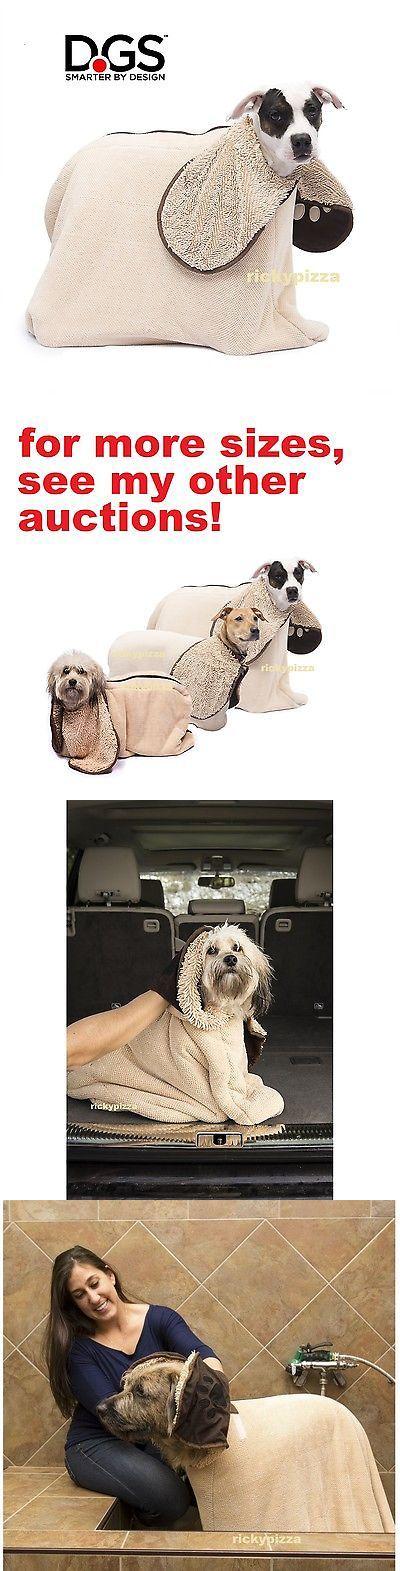 Blankets 116377: Dog Gone Smart Zip N Dri Wet Shake Dry Bath Towel M Medium Microfiber Blanket BUY IT NOW ONLY: $39.94